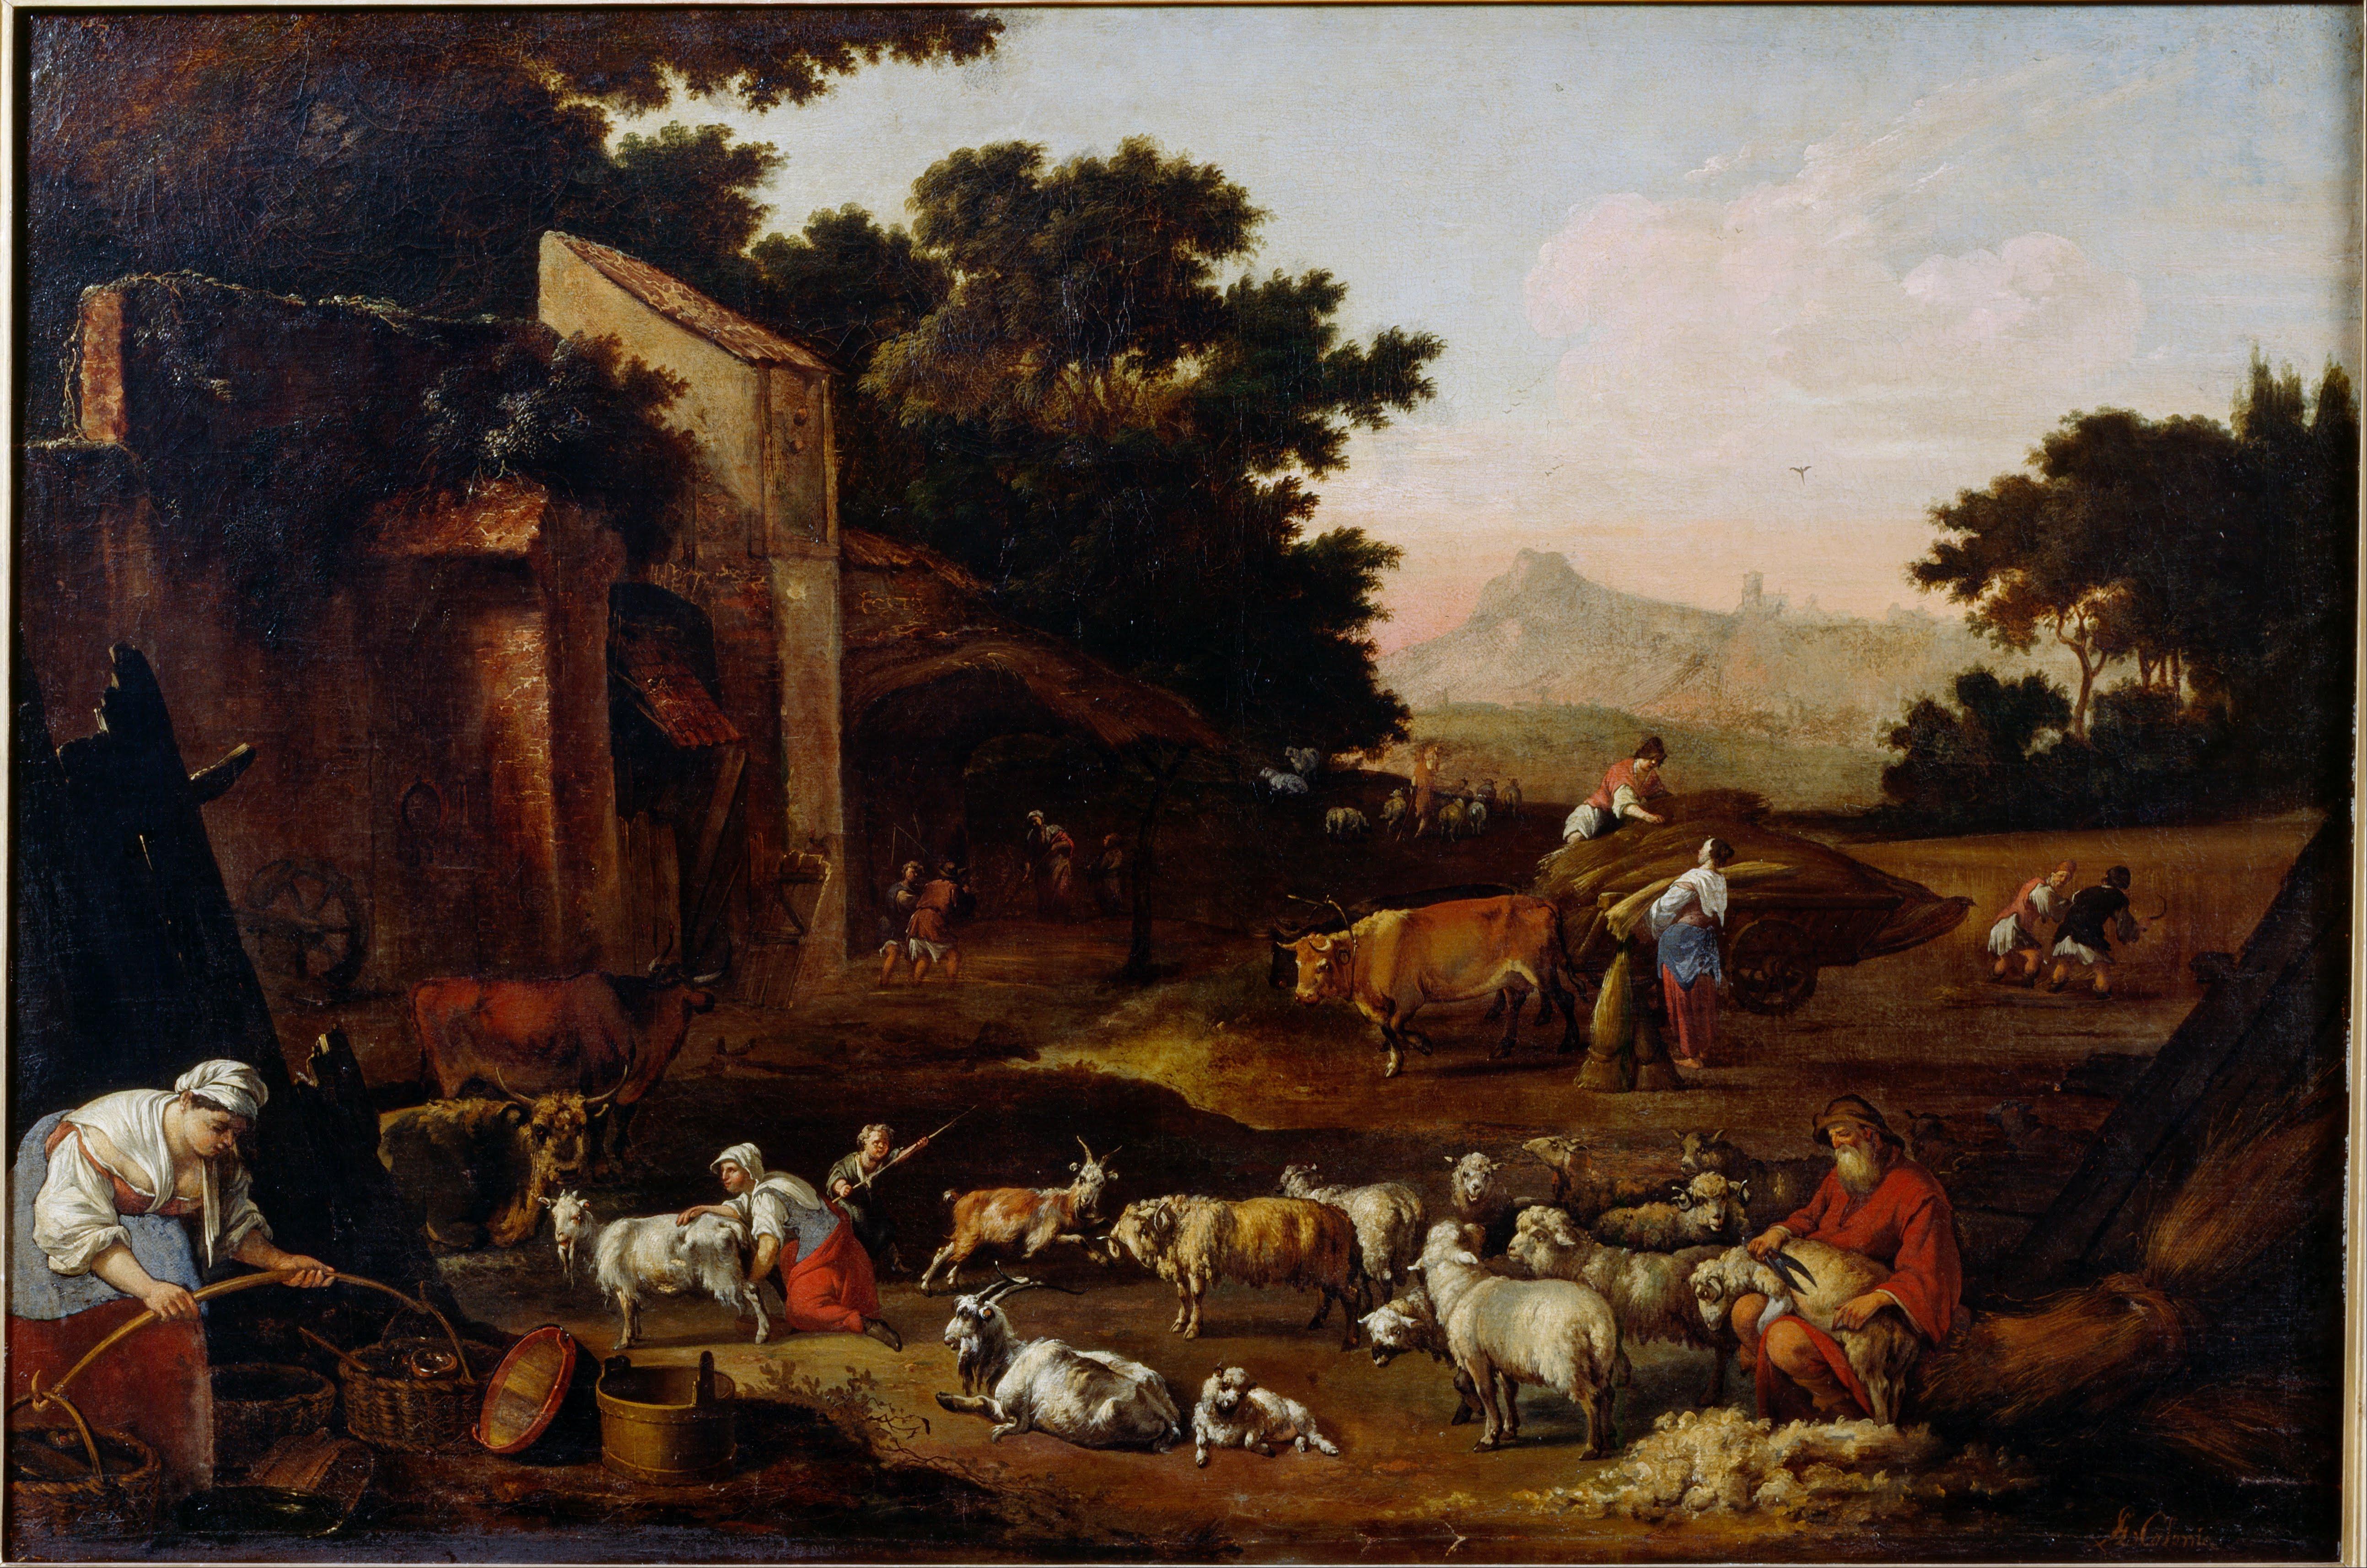 file colonia  adam - sheep shearing - google art project jpg